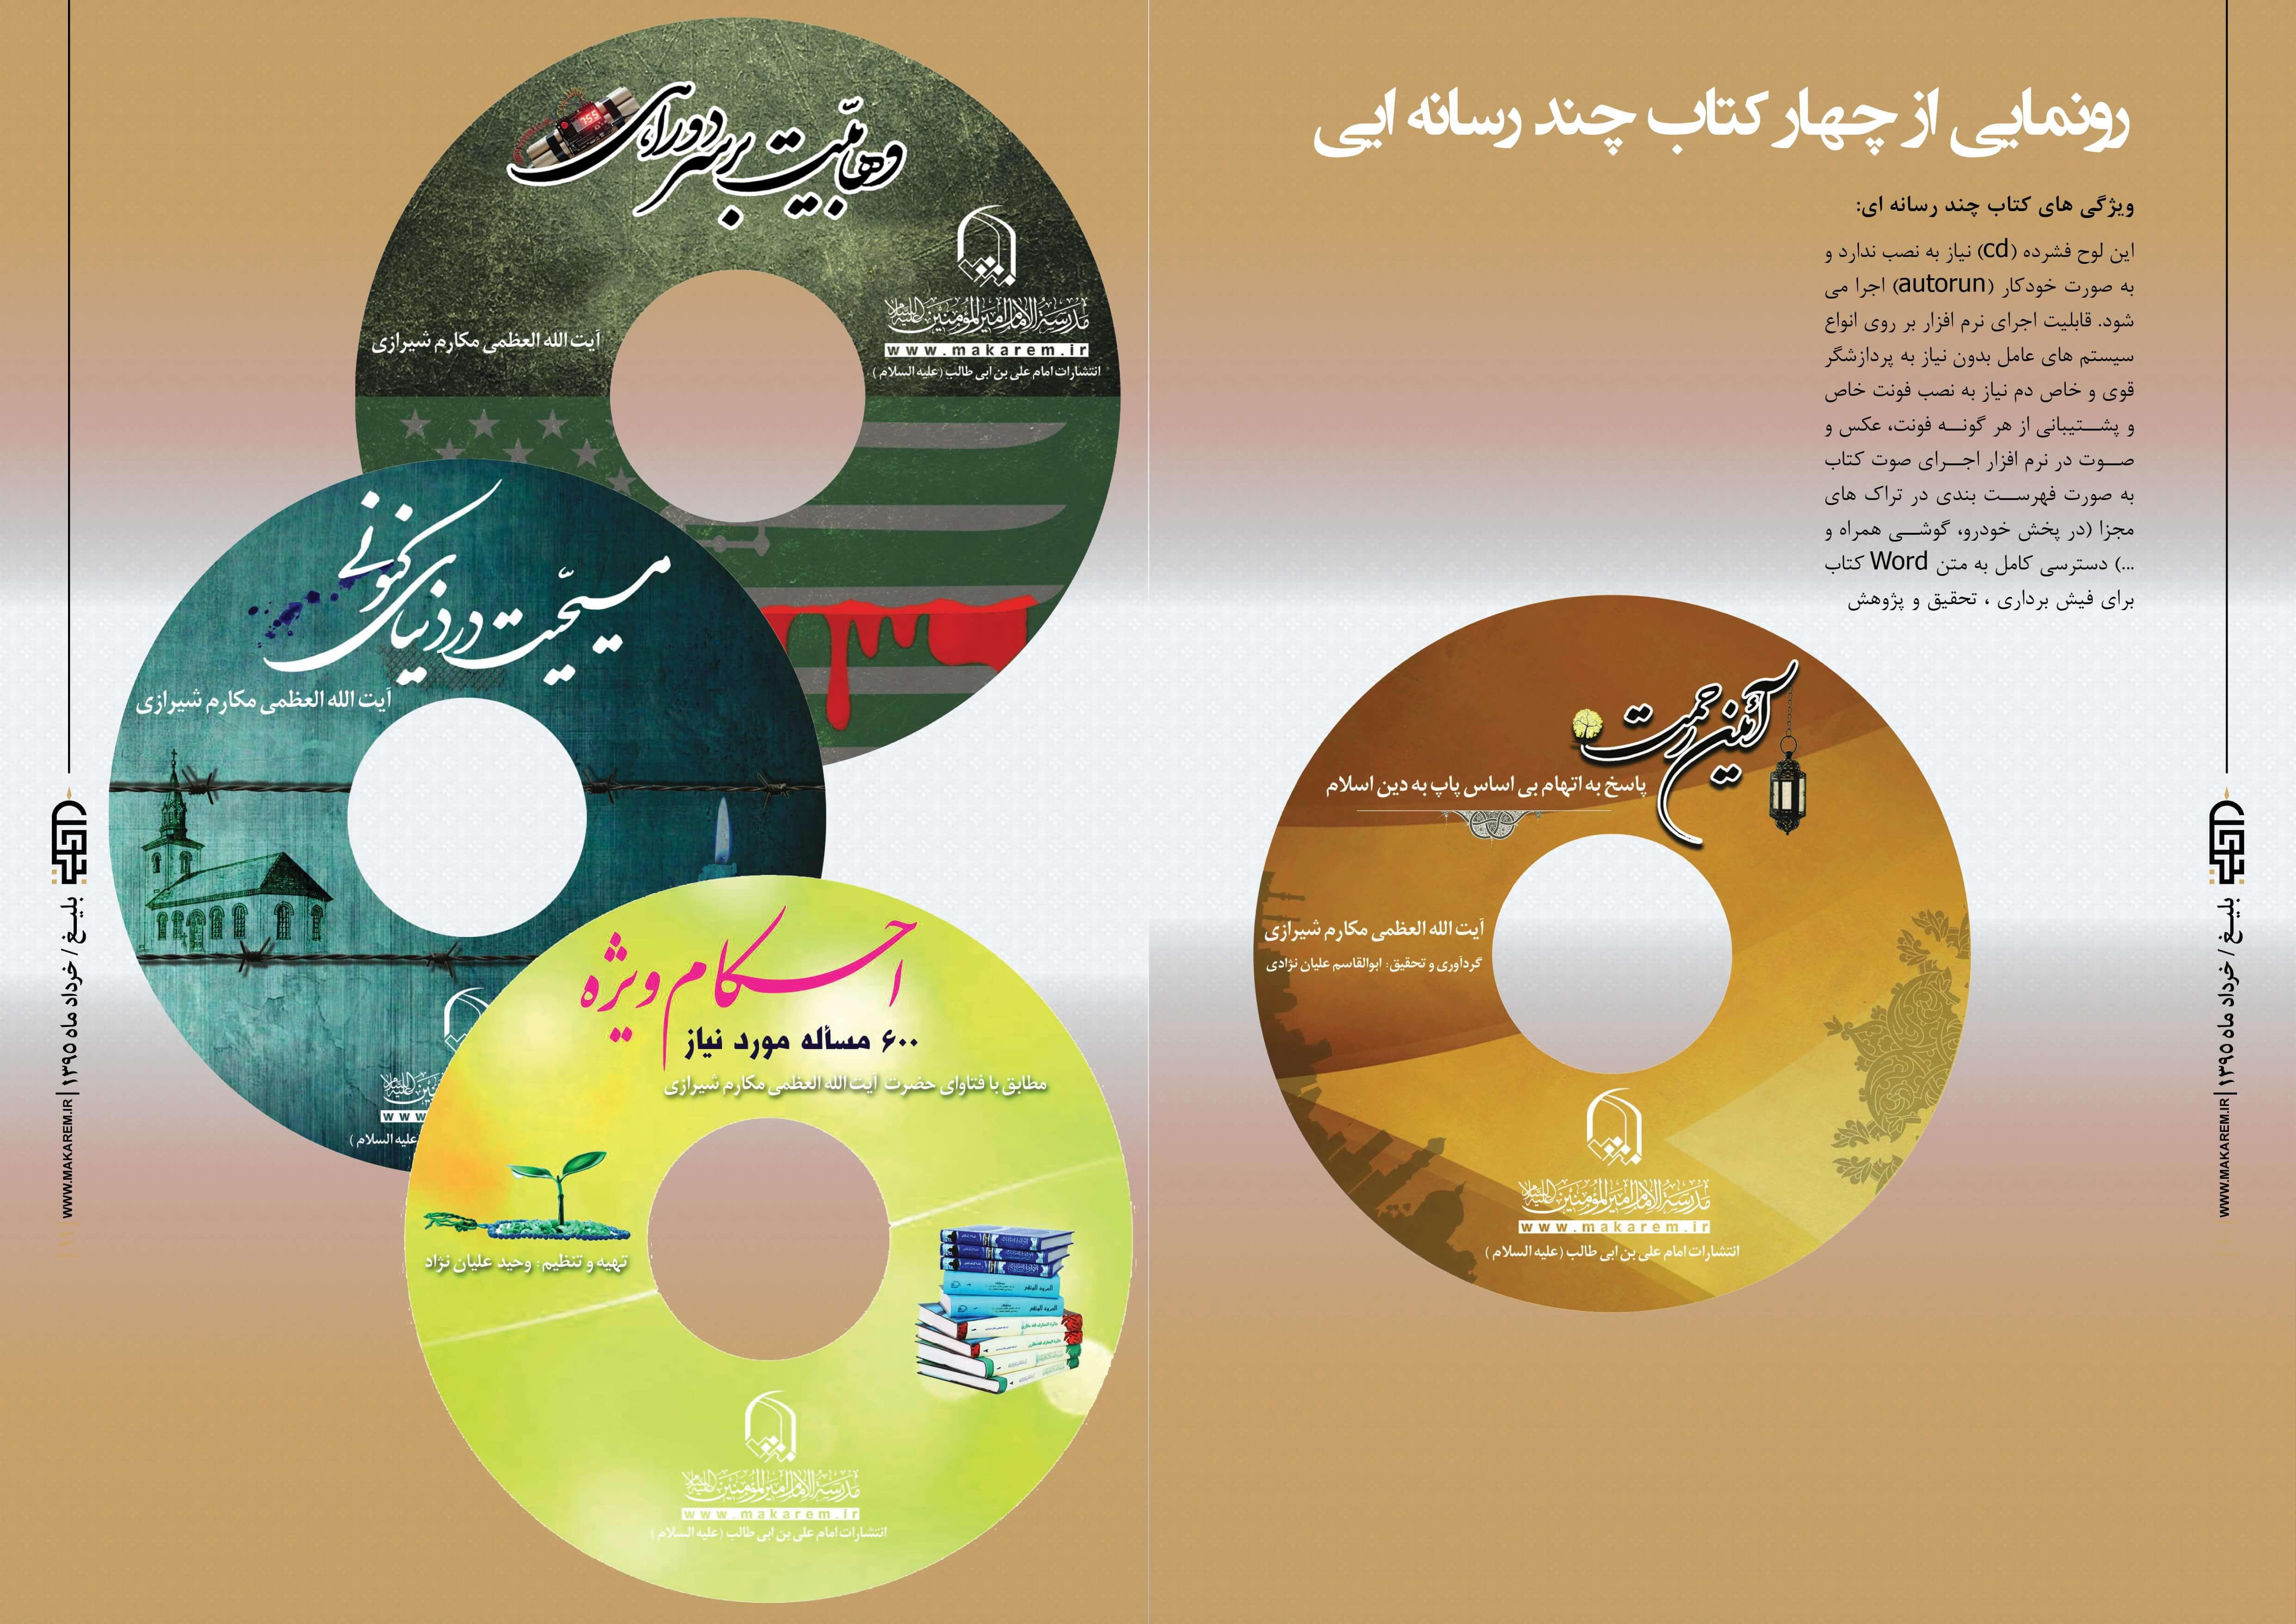 بلیغ 06-مدرسه الامام امیر المومنین (ع)